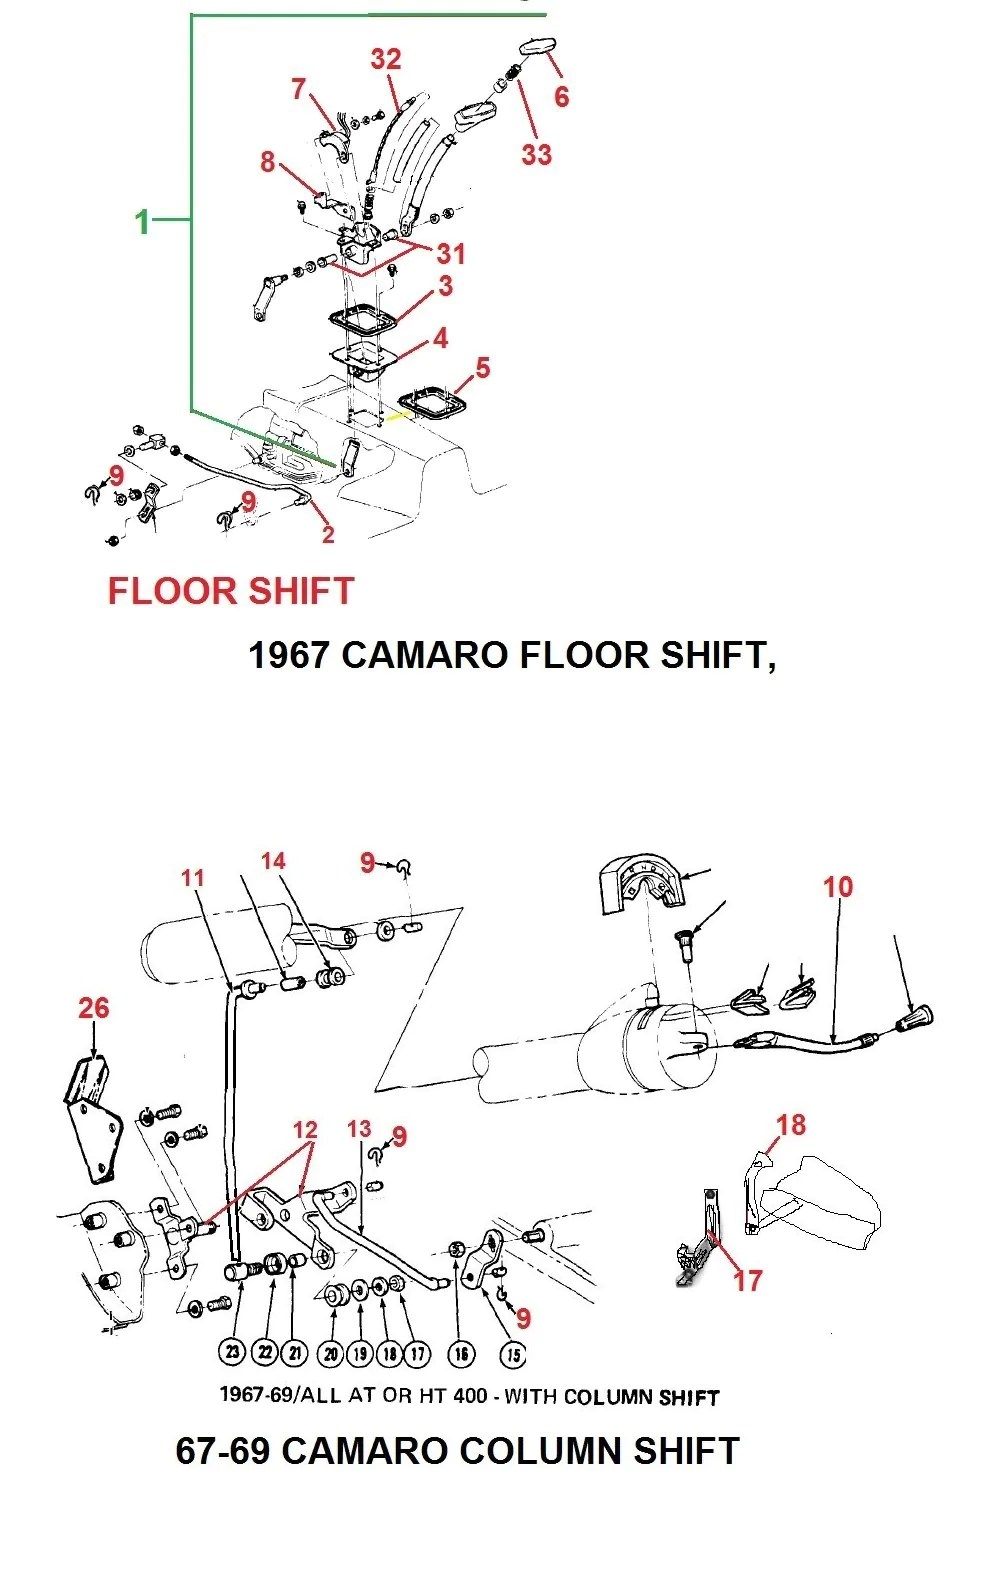 1967 camaro auto floor shifter 67 69 camaro column shift parts [ 1008 x 1572 Pixel ]